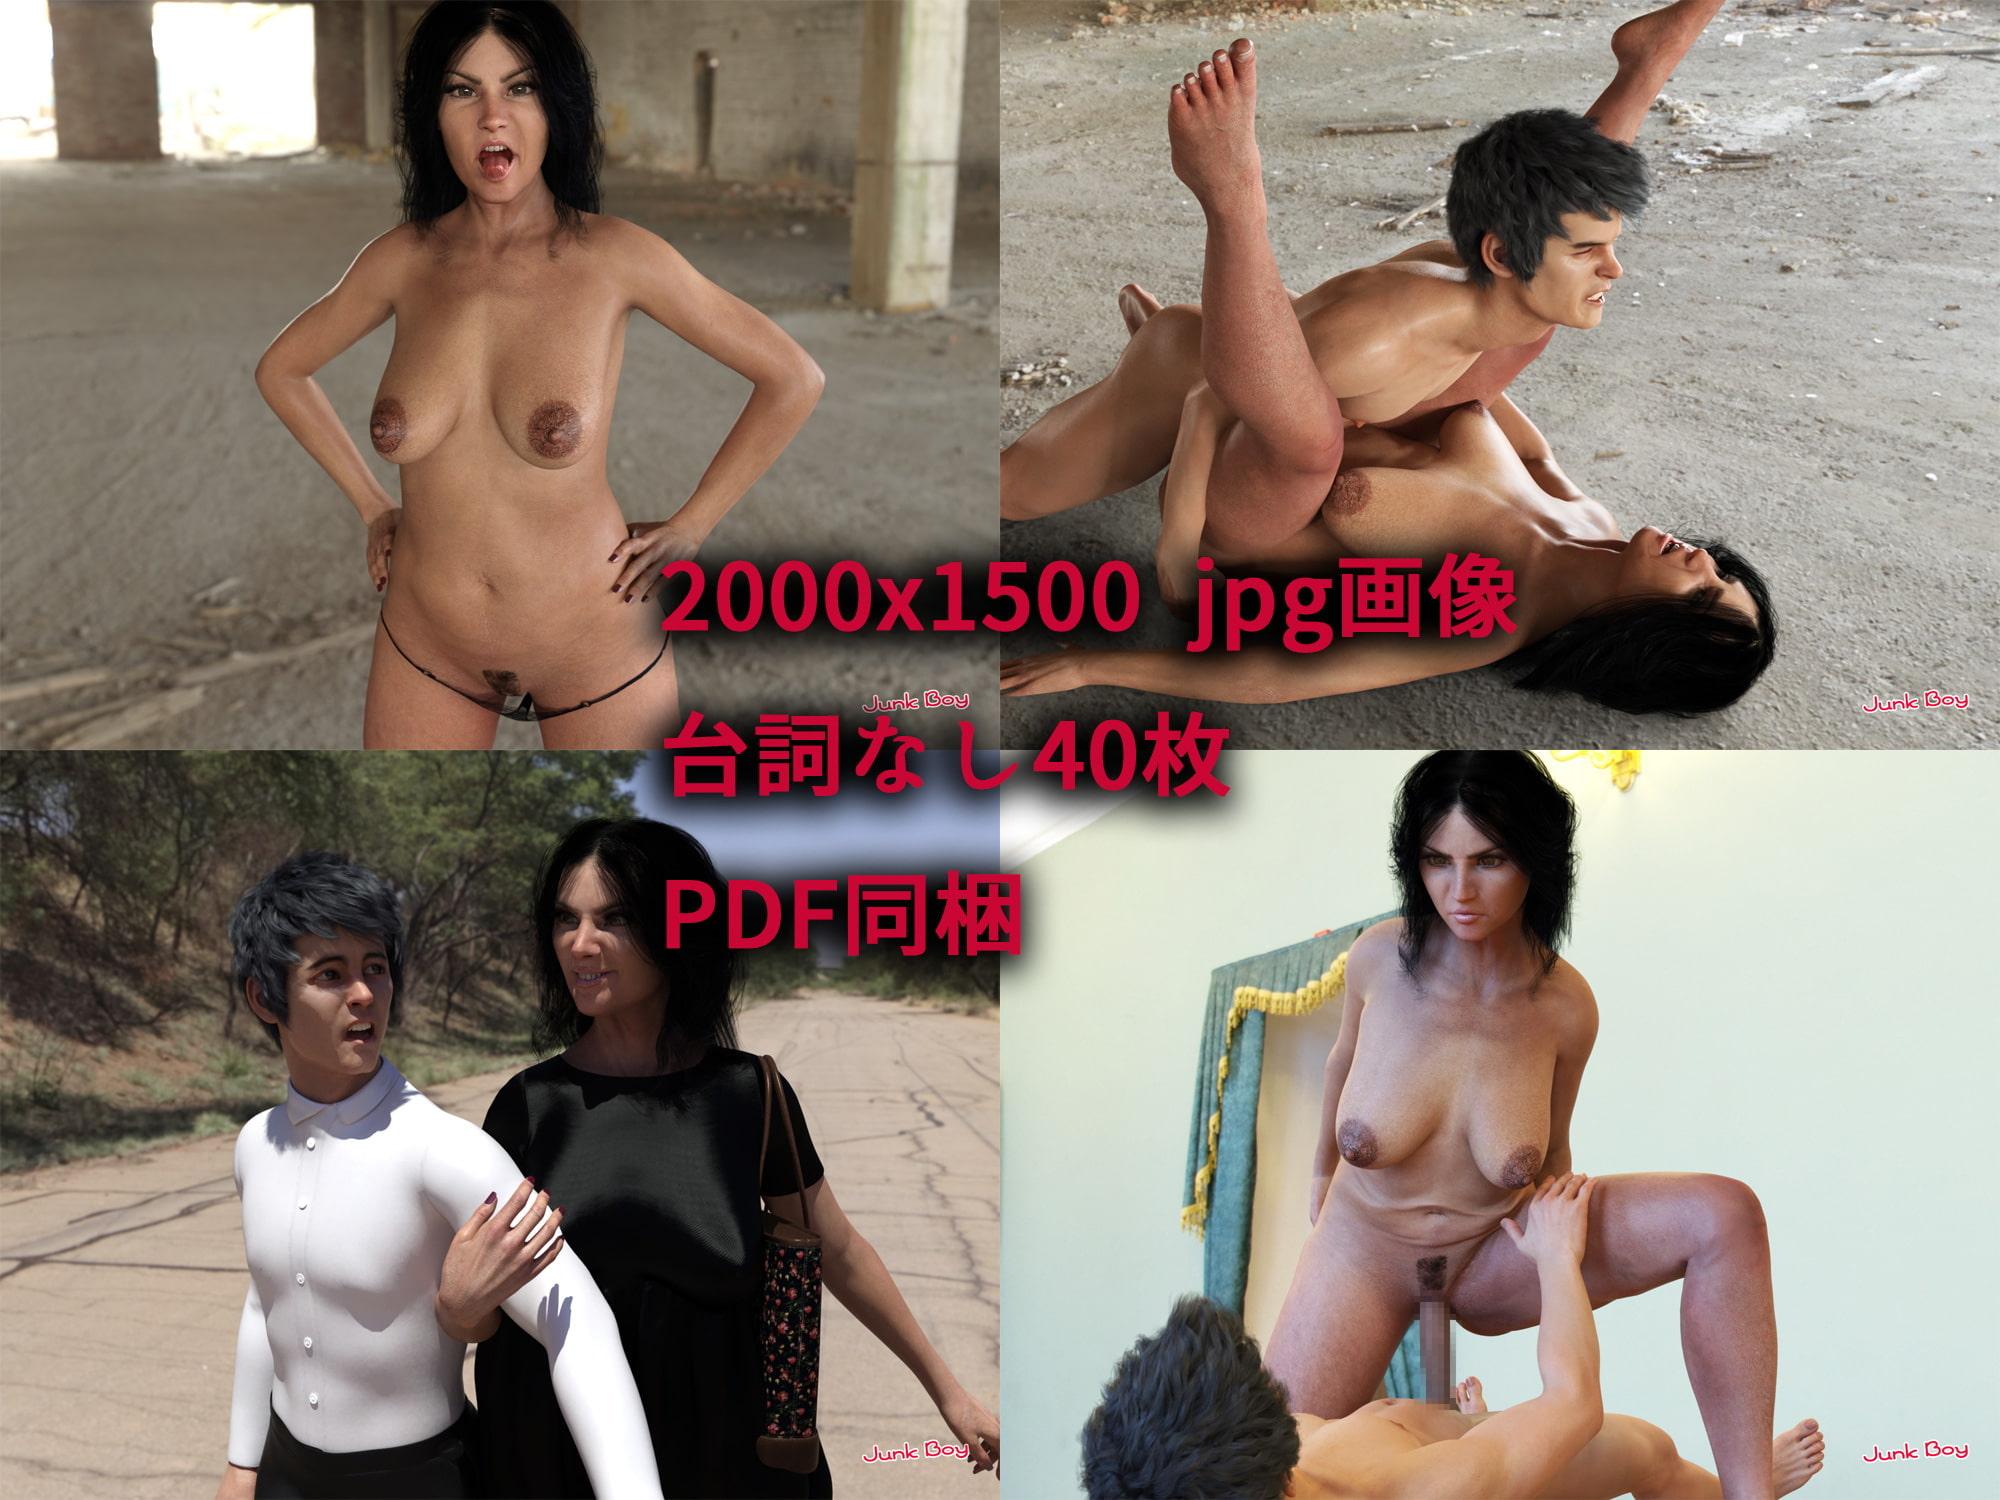 RJ348148 Junk Boy 総集編 [20211008]